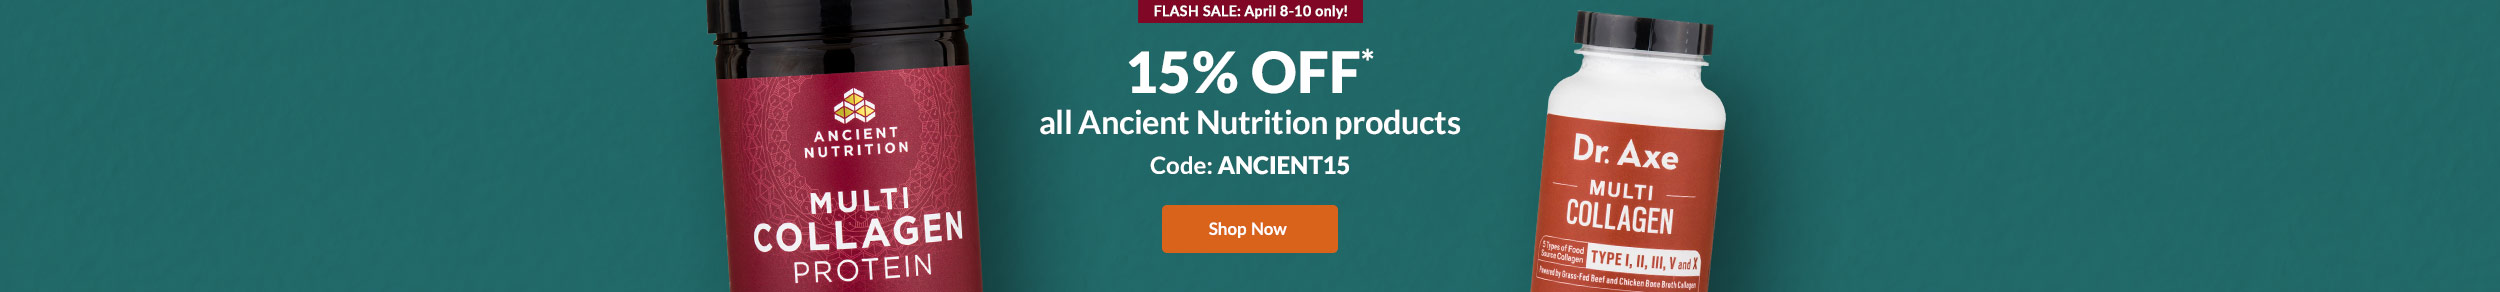 https://i3.pureformulas.net/images/static/ancient-nutritions_Store_040120.jpg